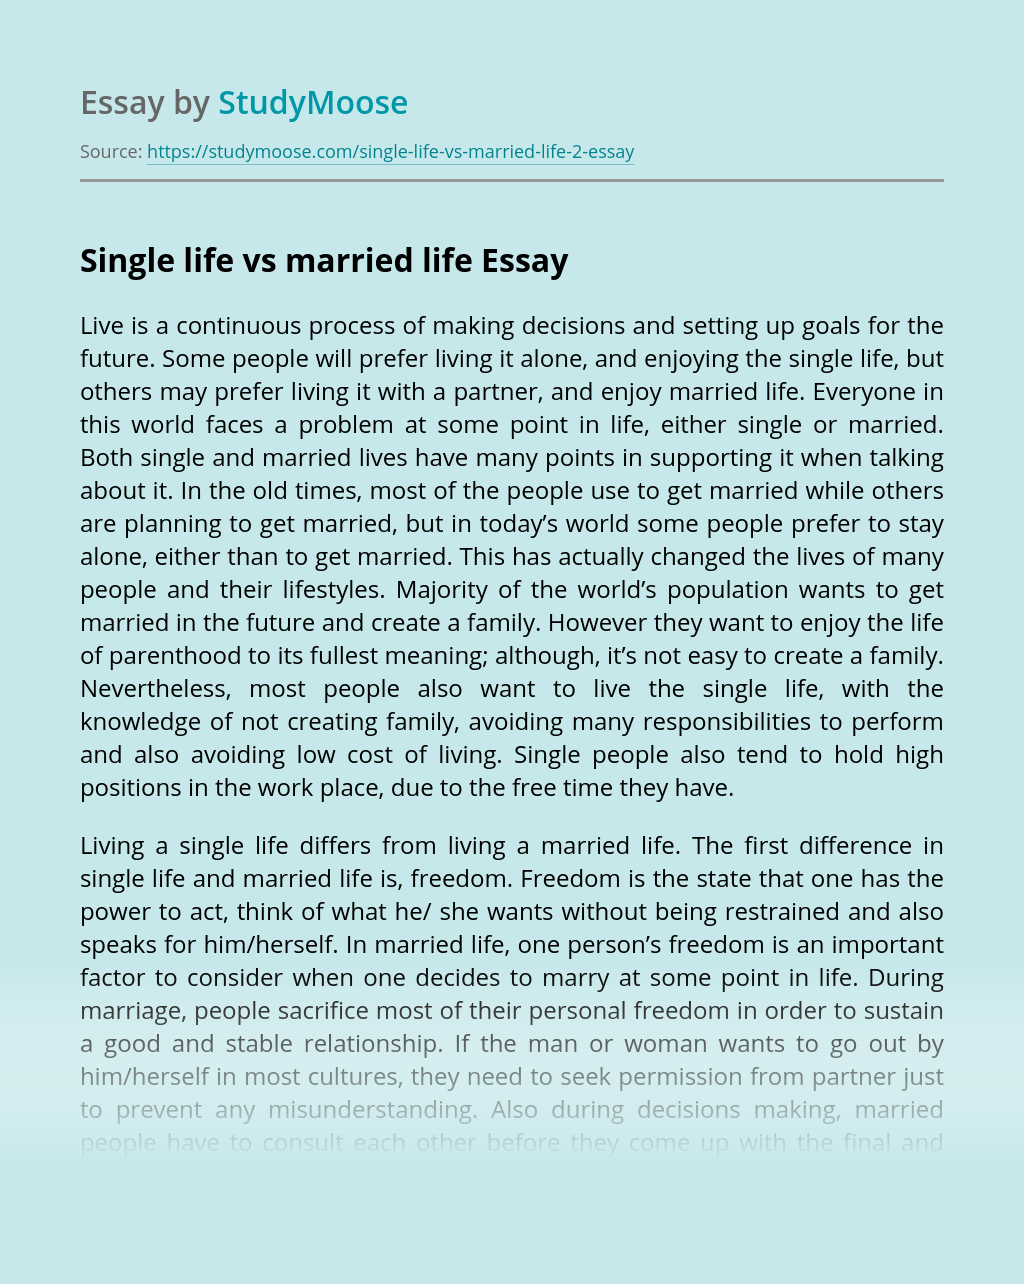 Single life vs married life